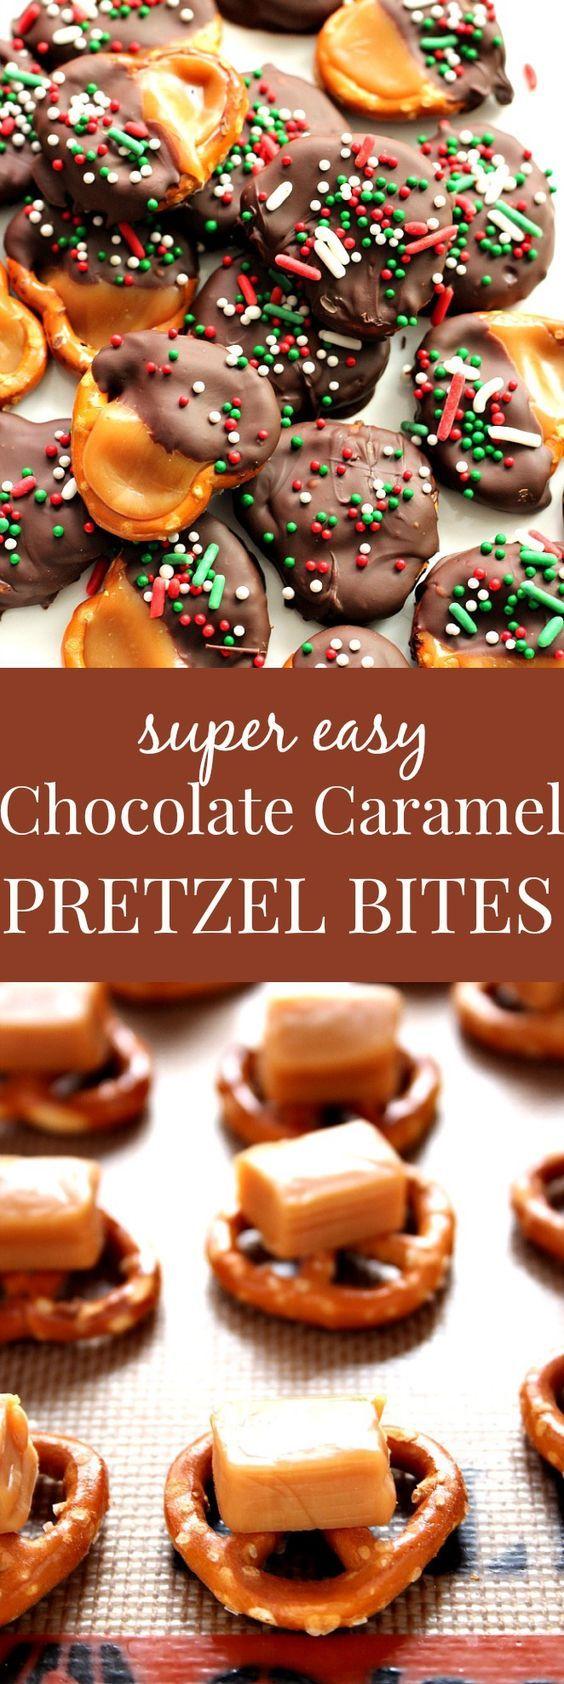 easy chocolate caramel pretzel bites recipe easy holiday desserts easy christmas baking recipes holiday - Easy Christmas Desserts Pinterest